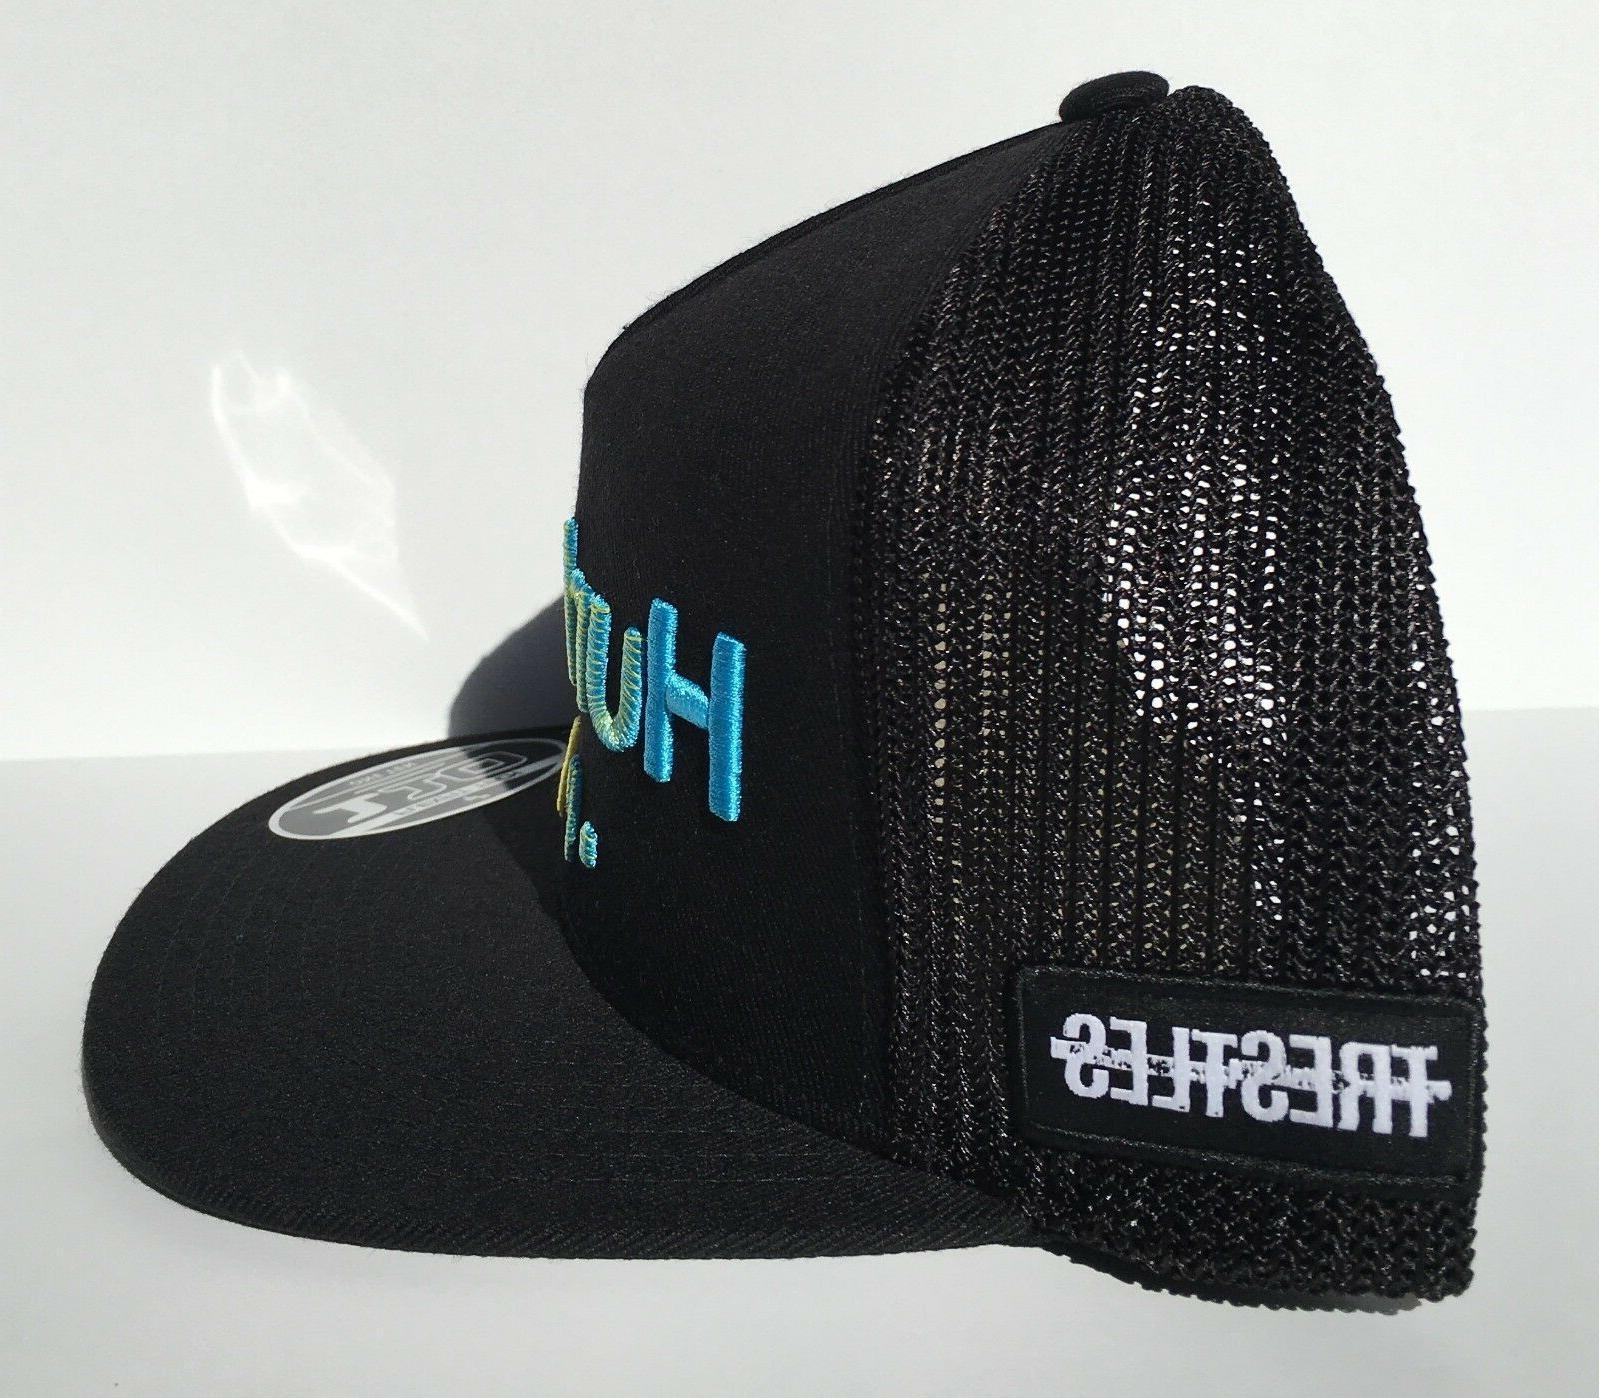 Hurley Pro Trestles 2017 Championship Snapback Hat Surf JJF